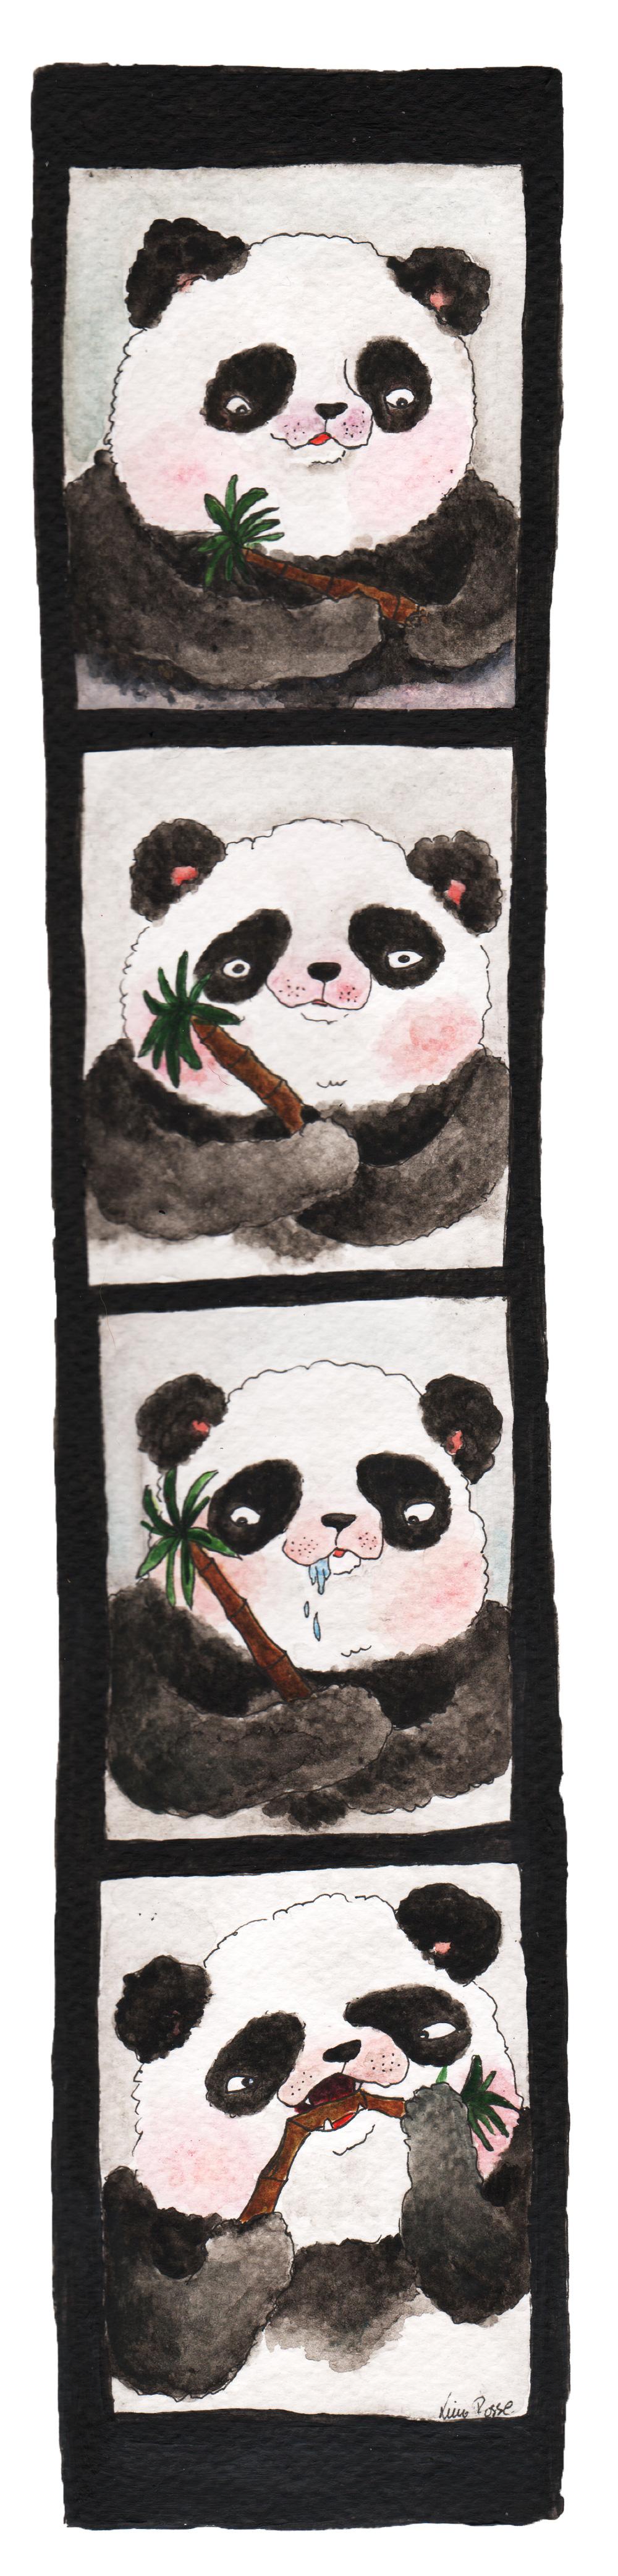 Så kan det se ut om en panda besöker en fotoautomat.